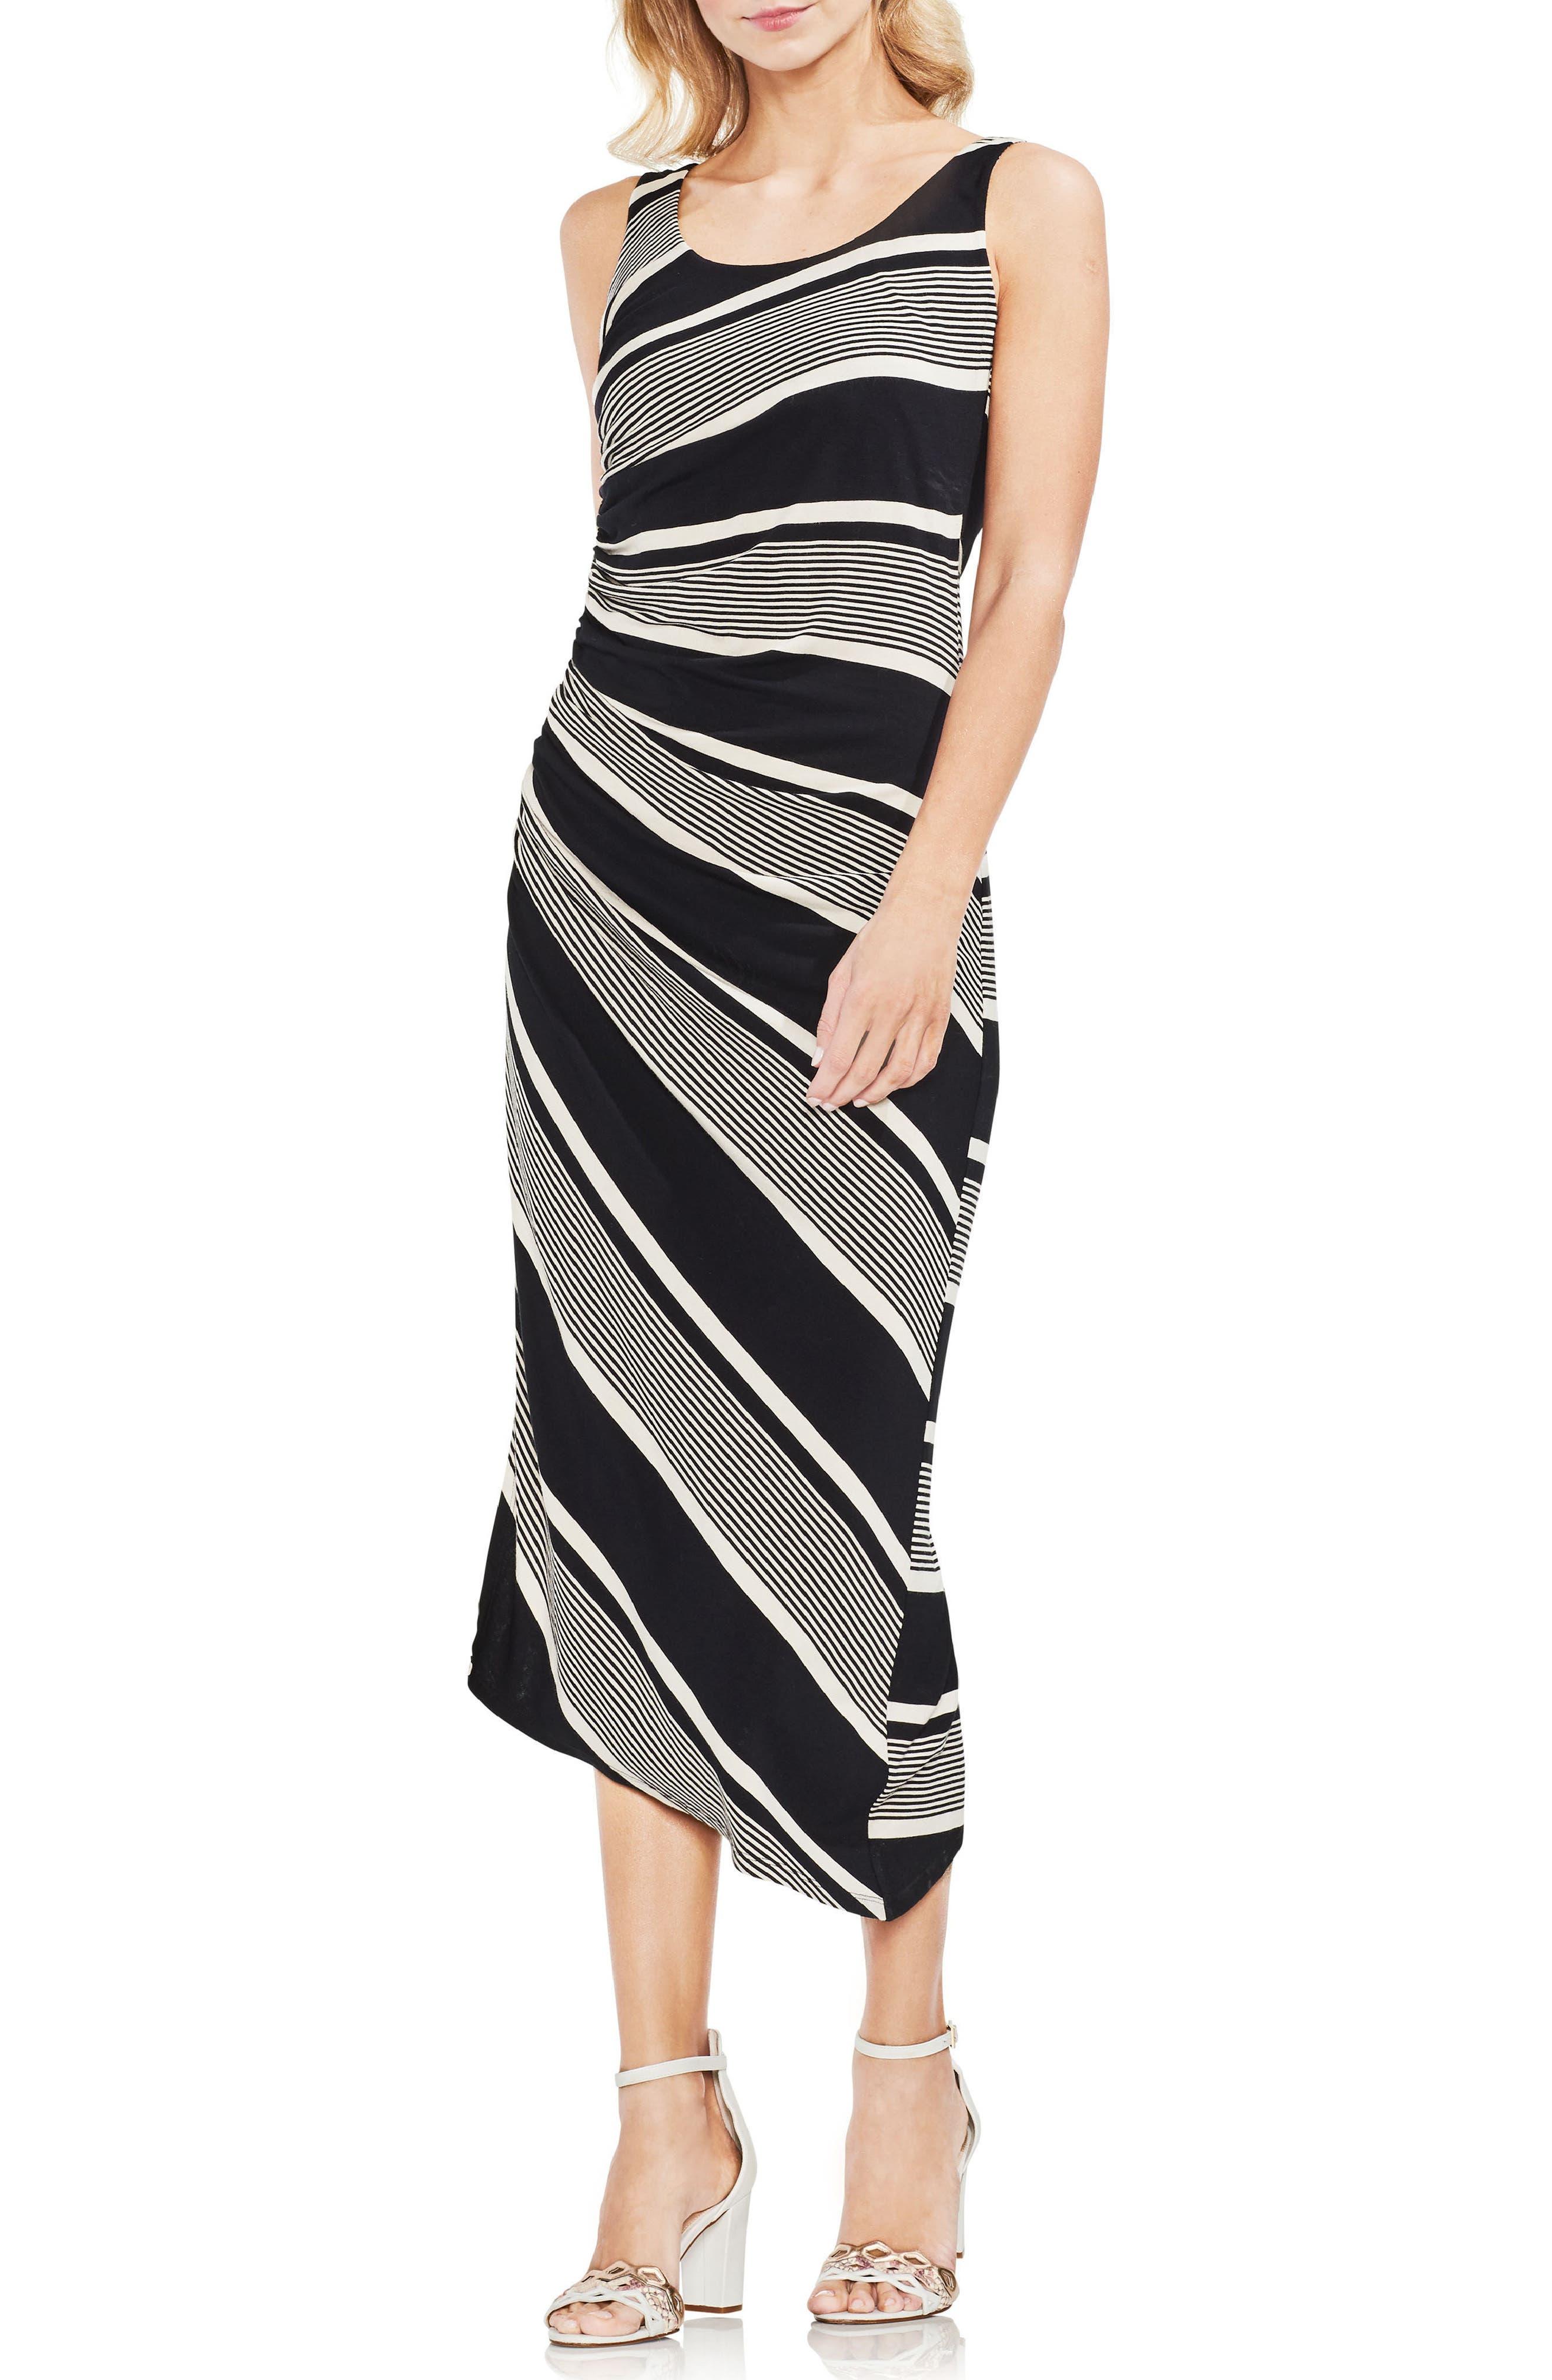 Venue Block Stripe Ruched Body-Con Dress,                             Main thumbnail 1, color,                             060-Rich Black